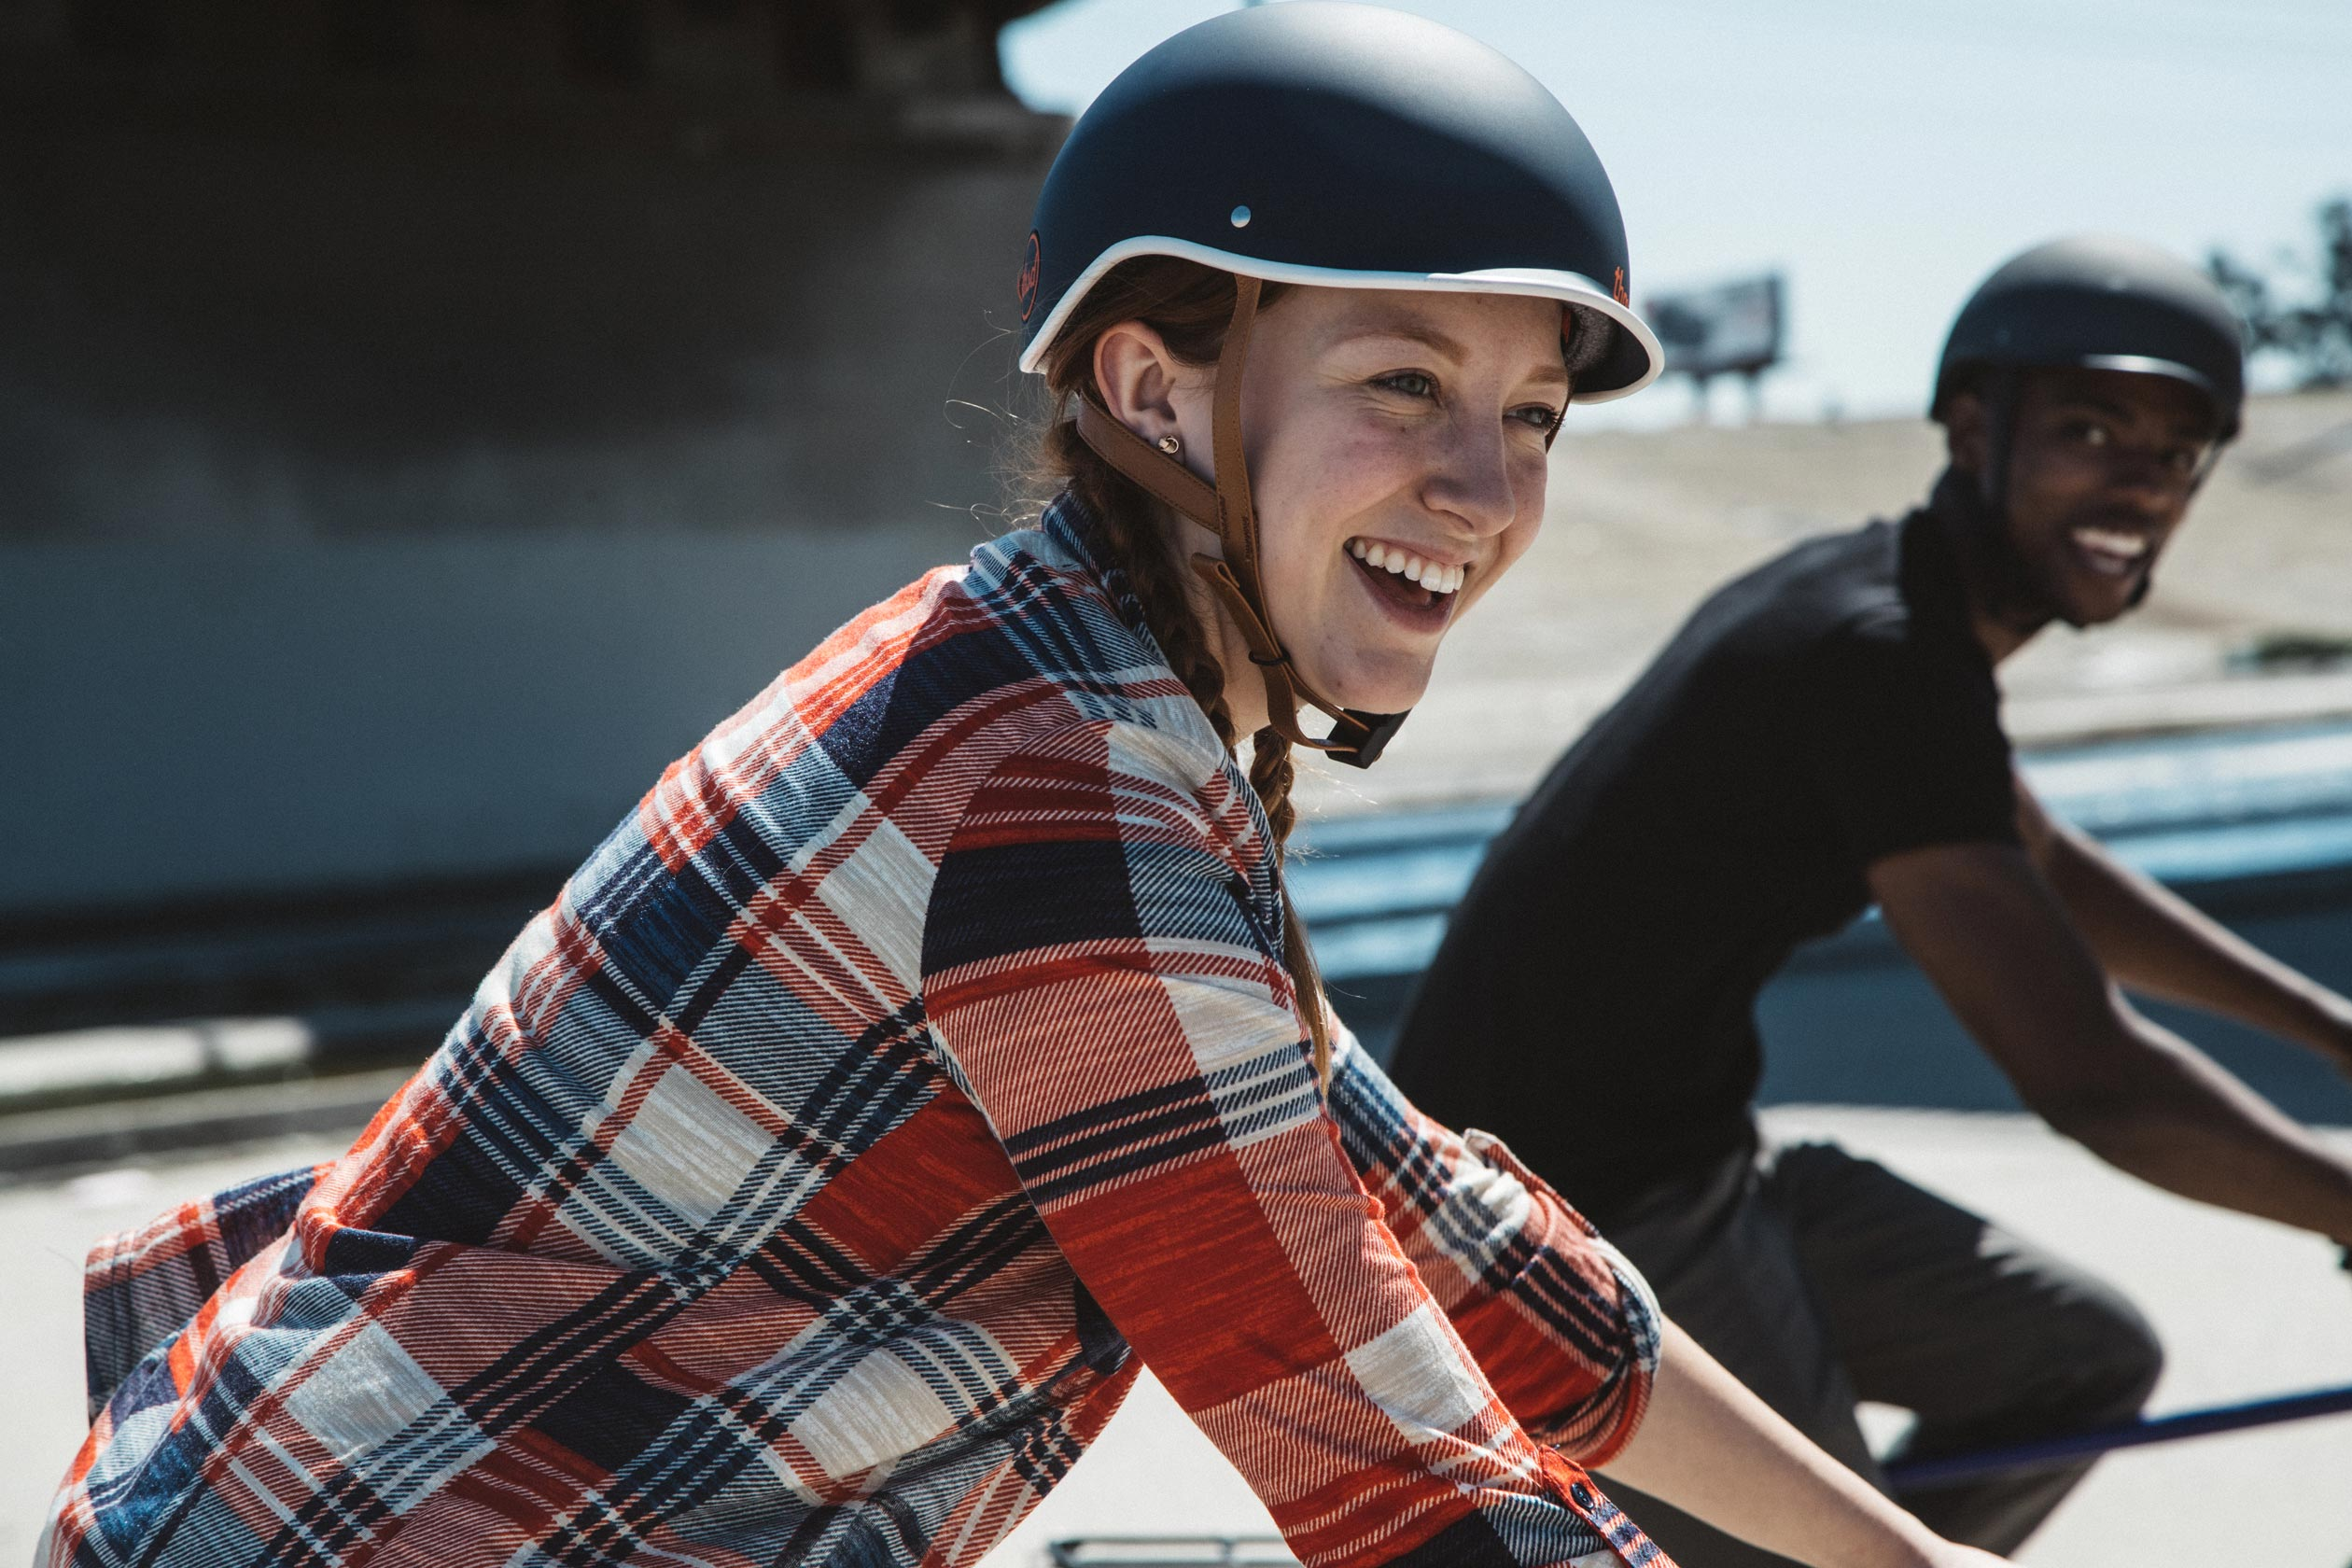 Heritage Bike Helmet, thousand Navy